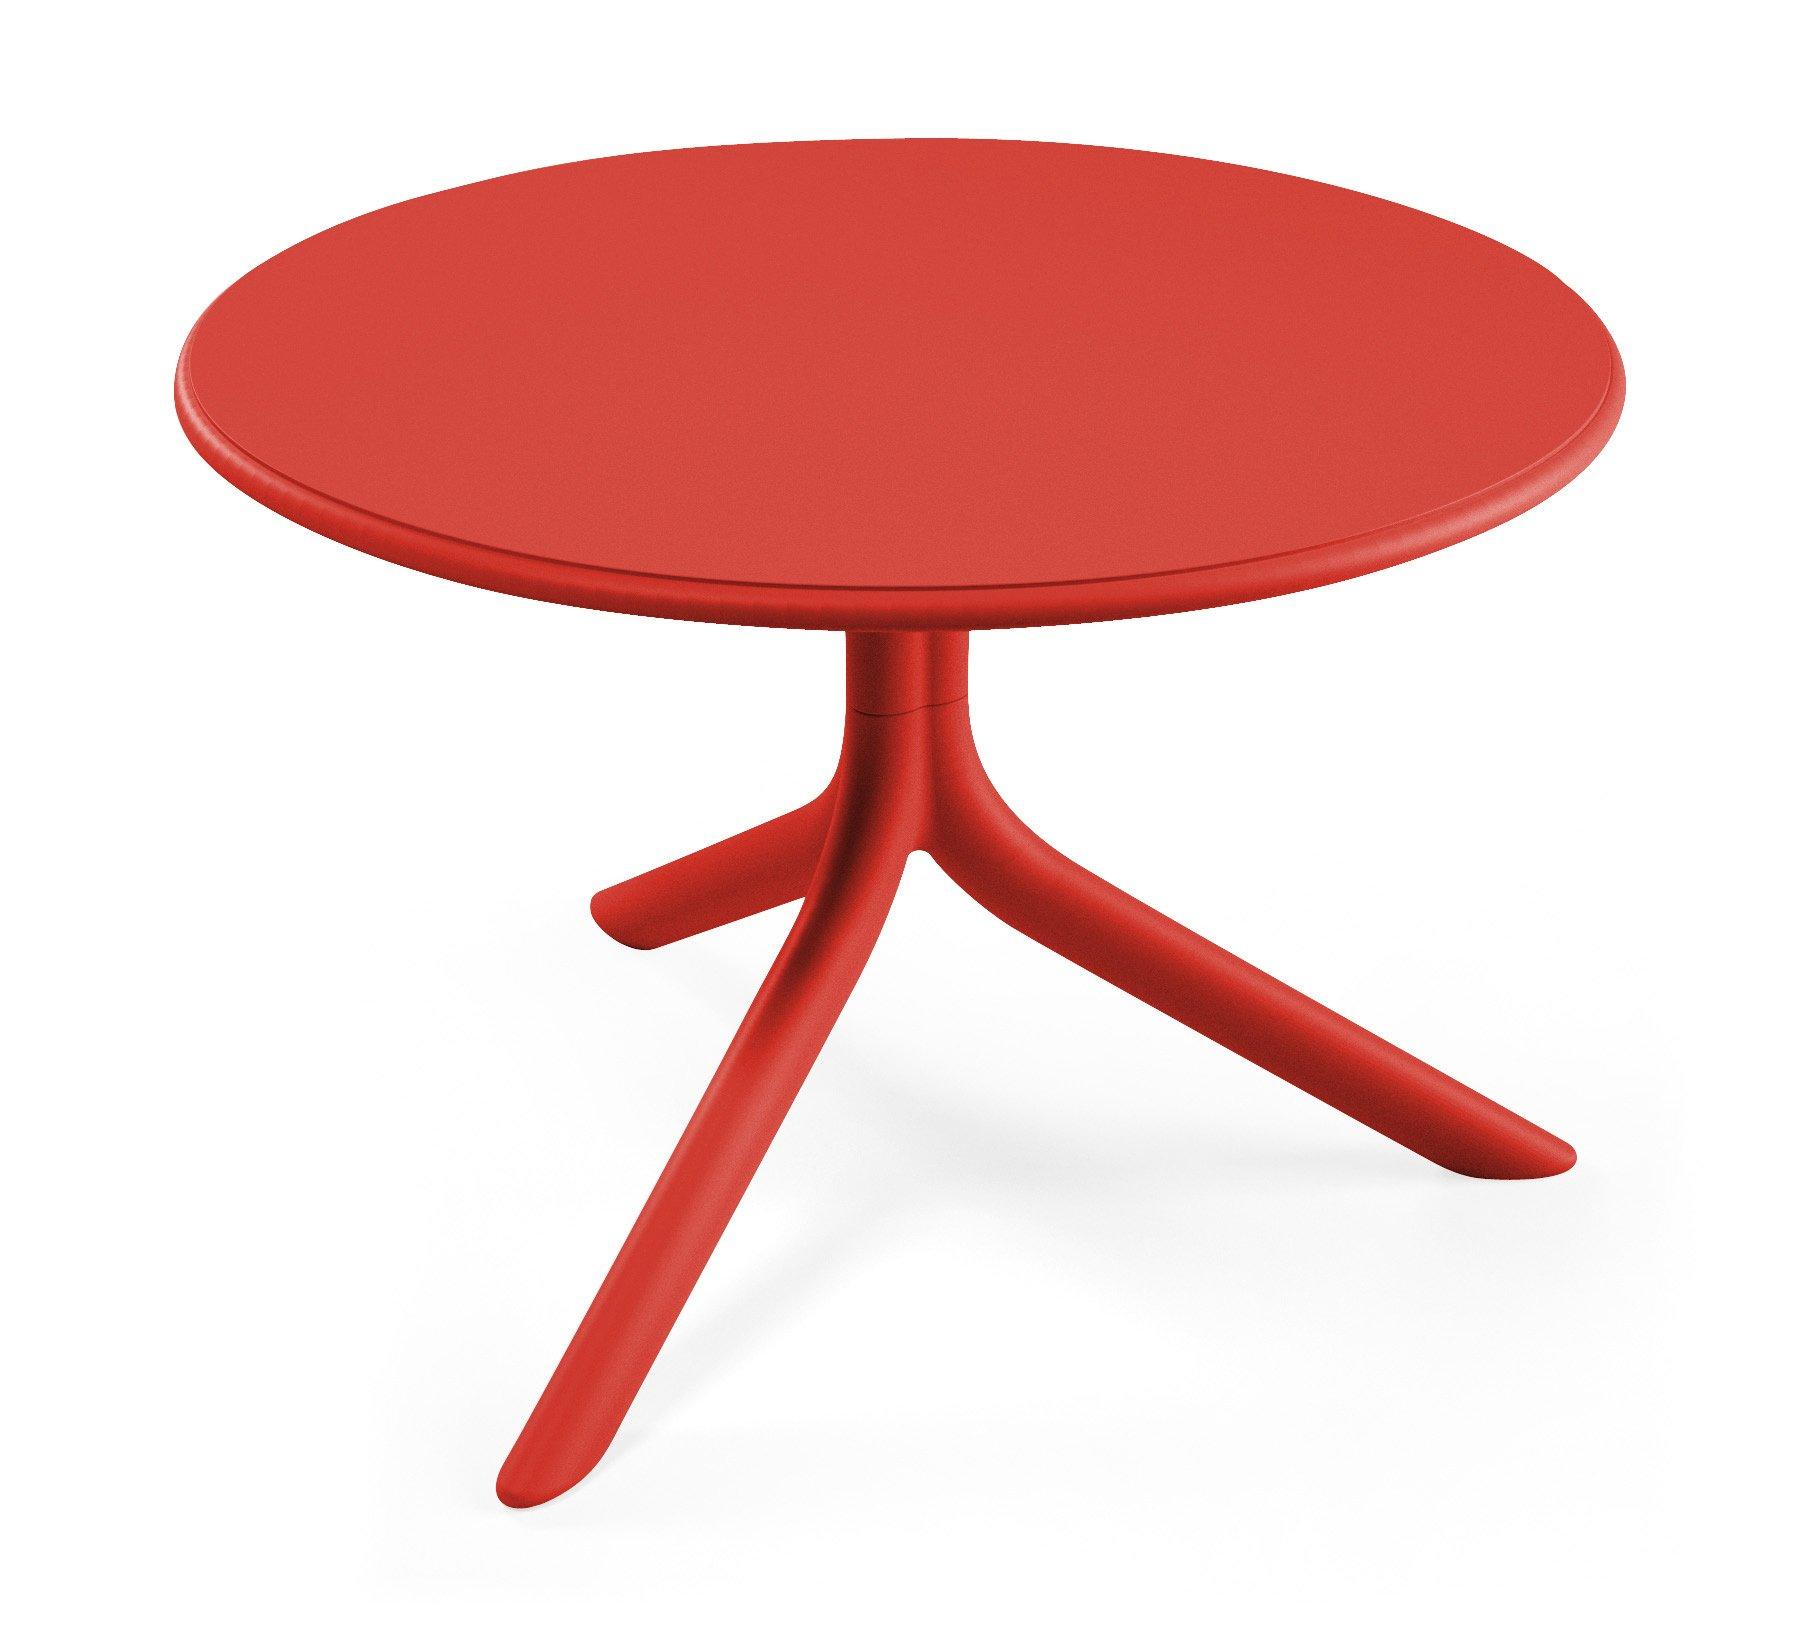 Tavolino spritz mini mobilclick - Table jardin d eveil bilingue chicco reims ...